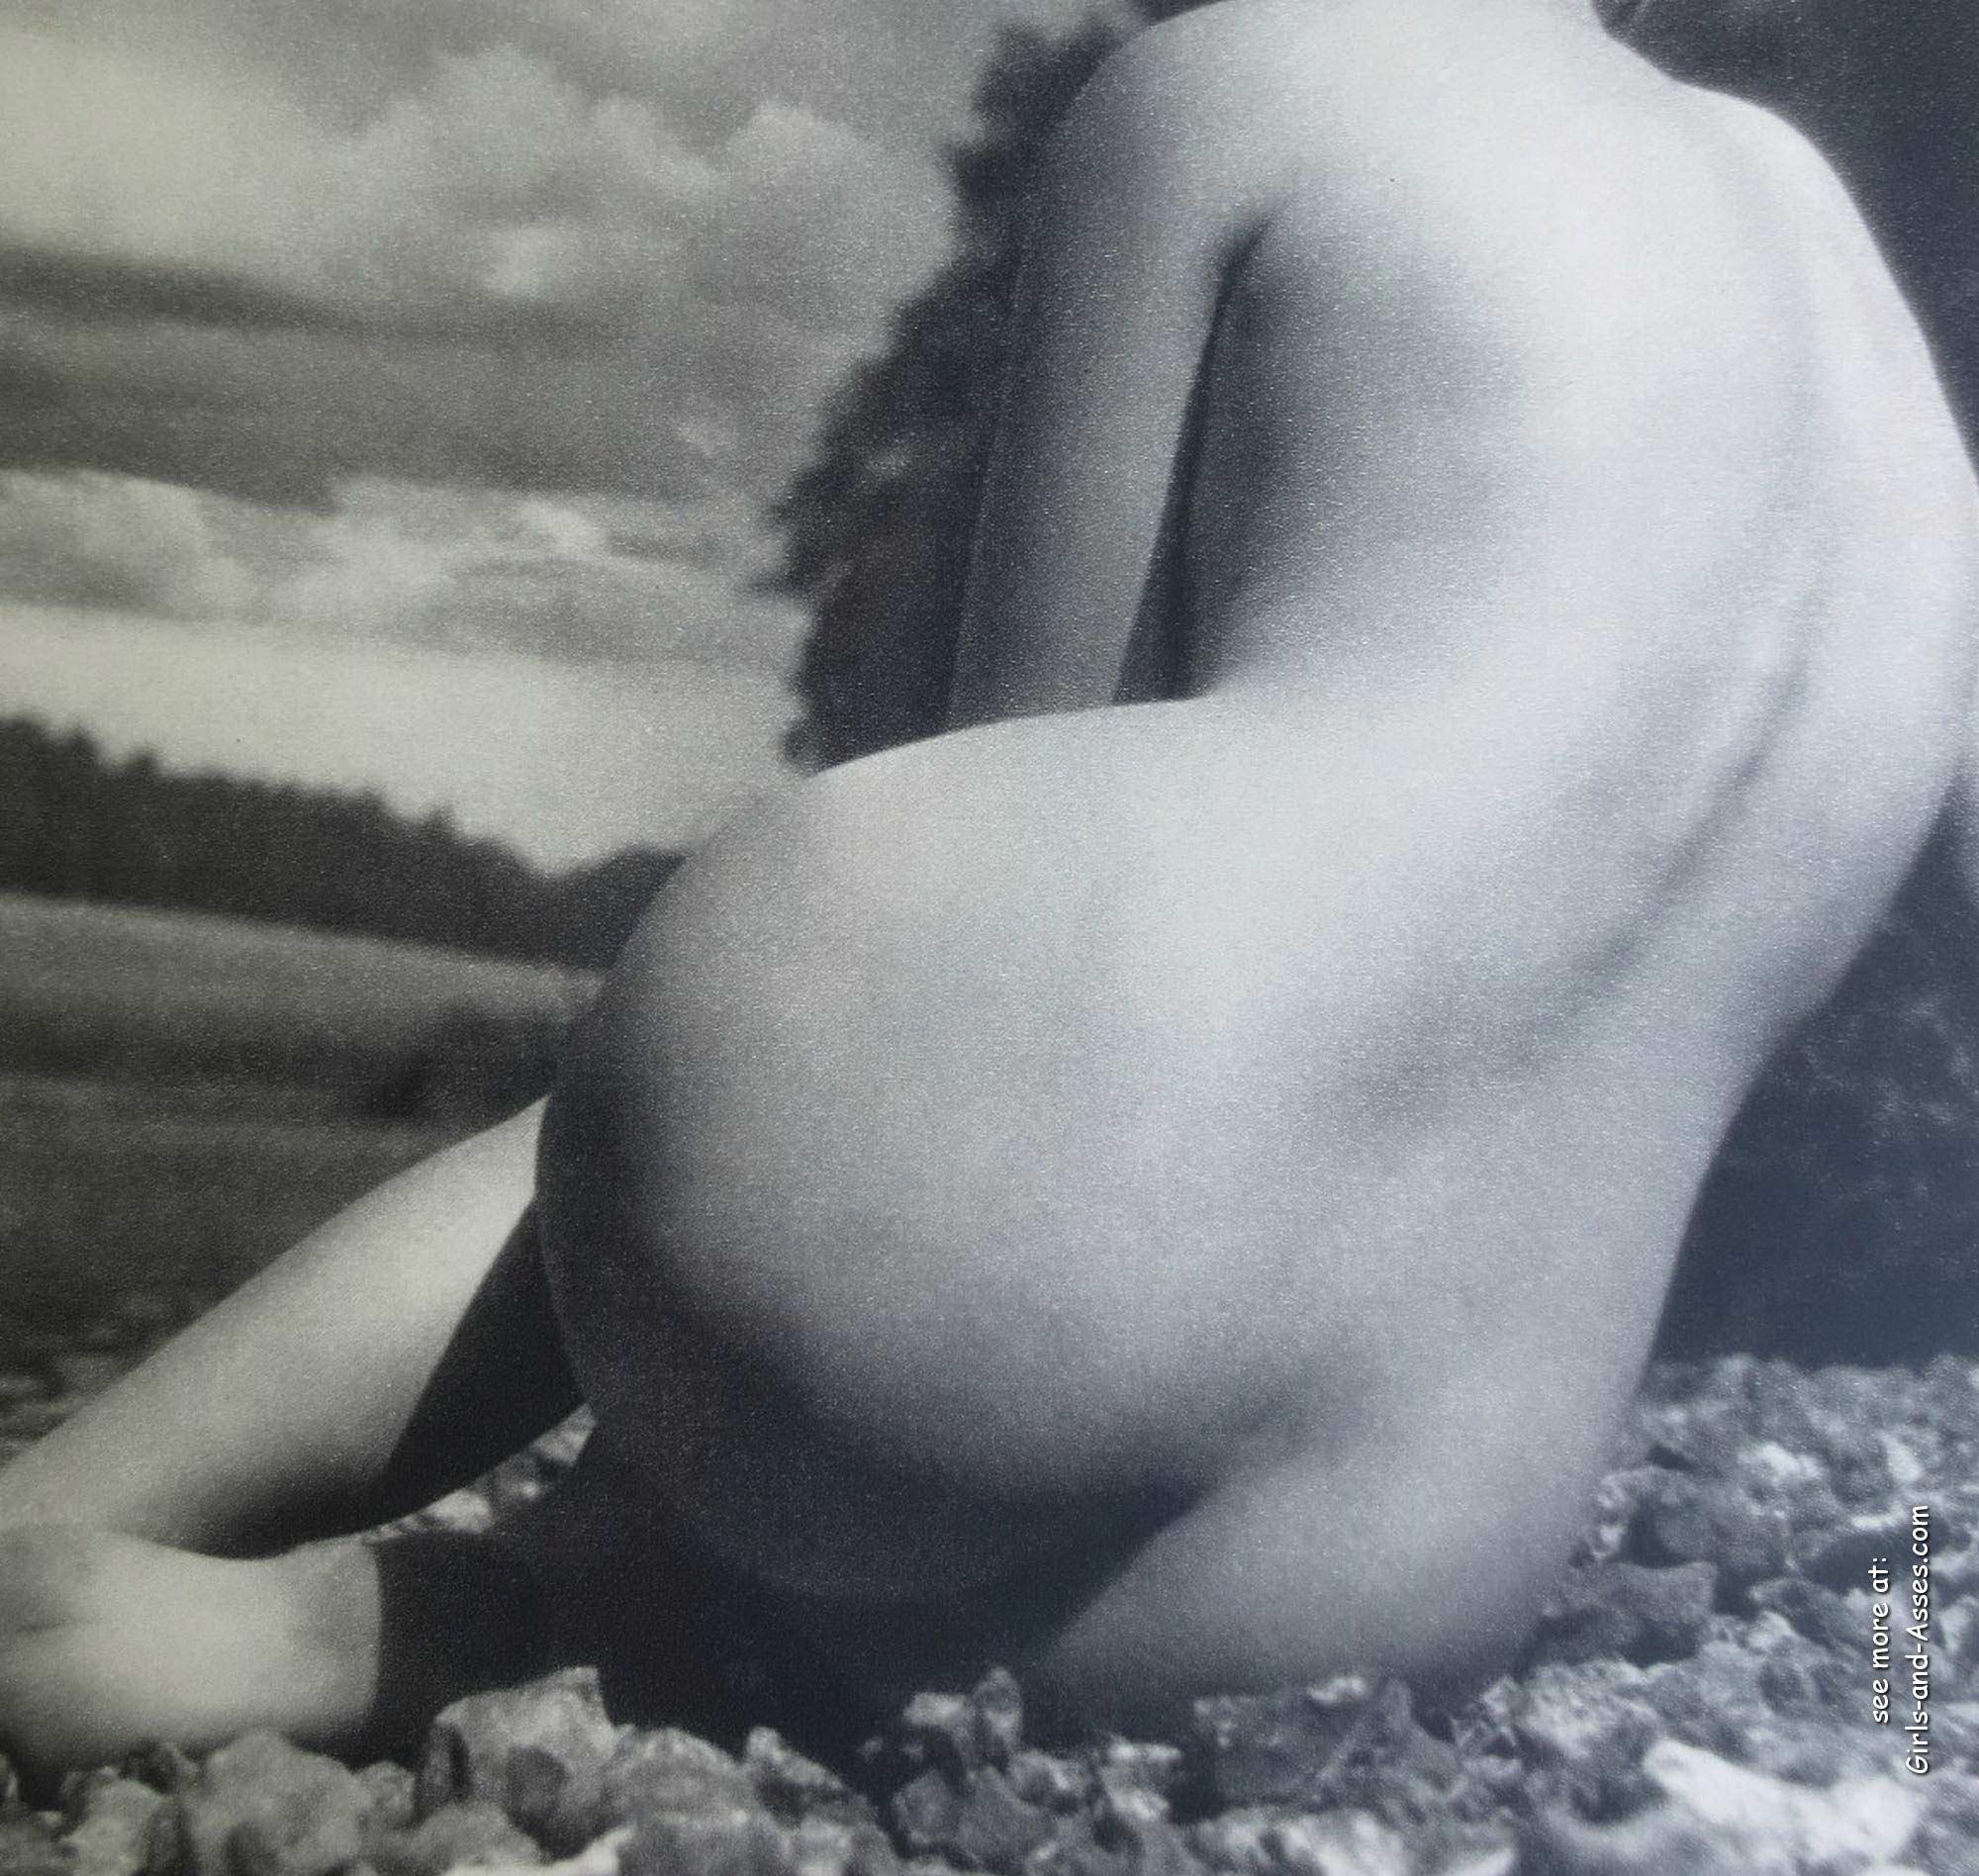 amatuer nude girl at the beach photography 01025